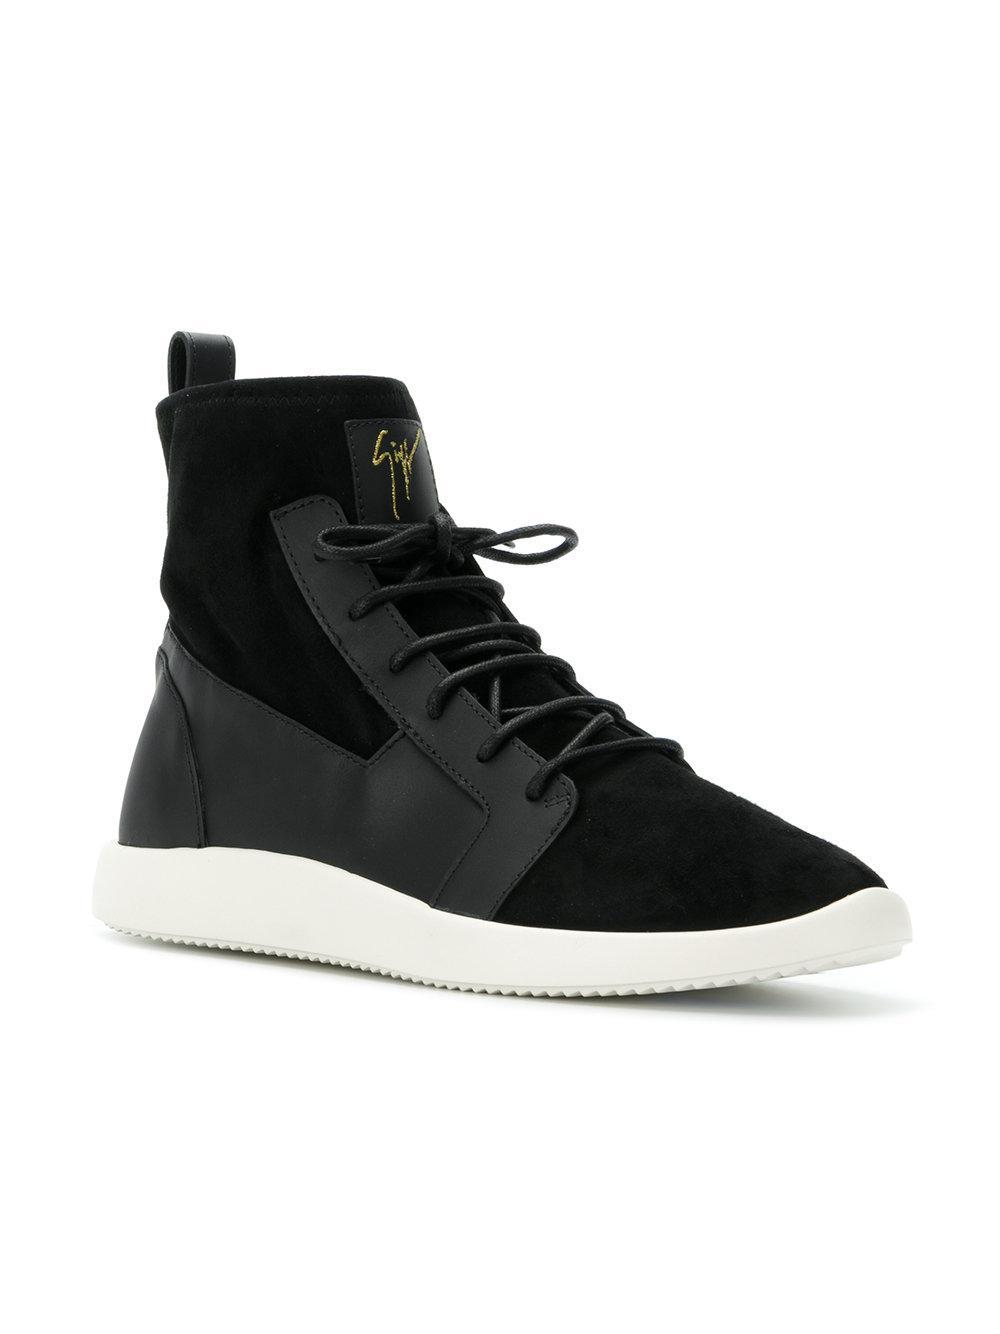 neoprene sock sneakers - Black Giuseppe Zanotti mYdpz5H